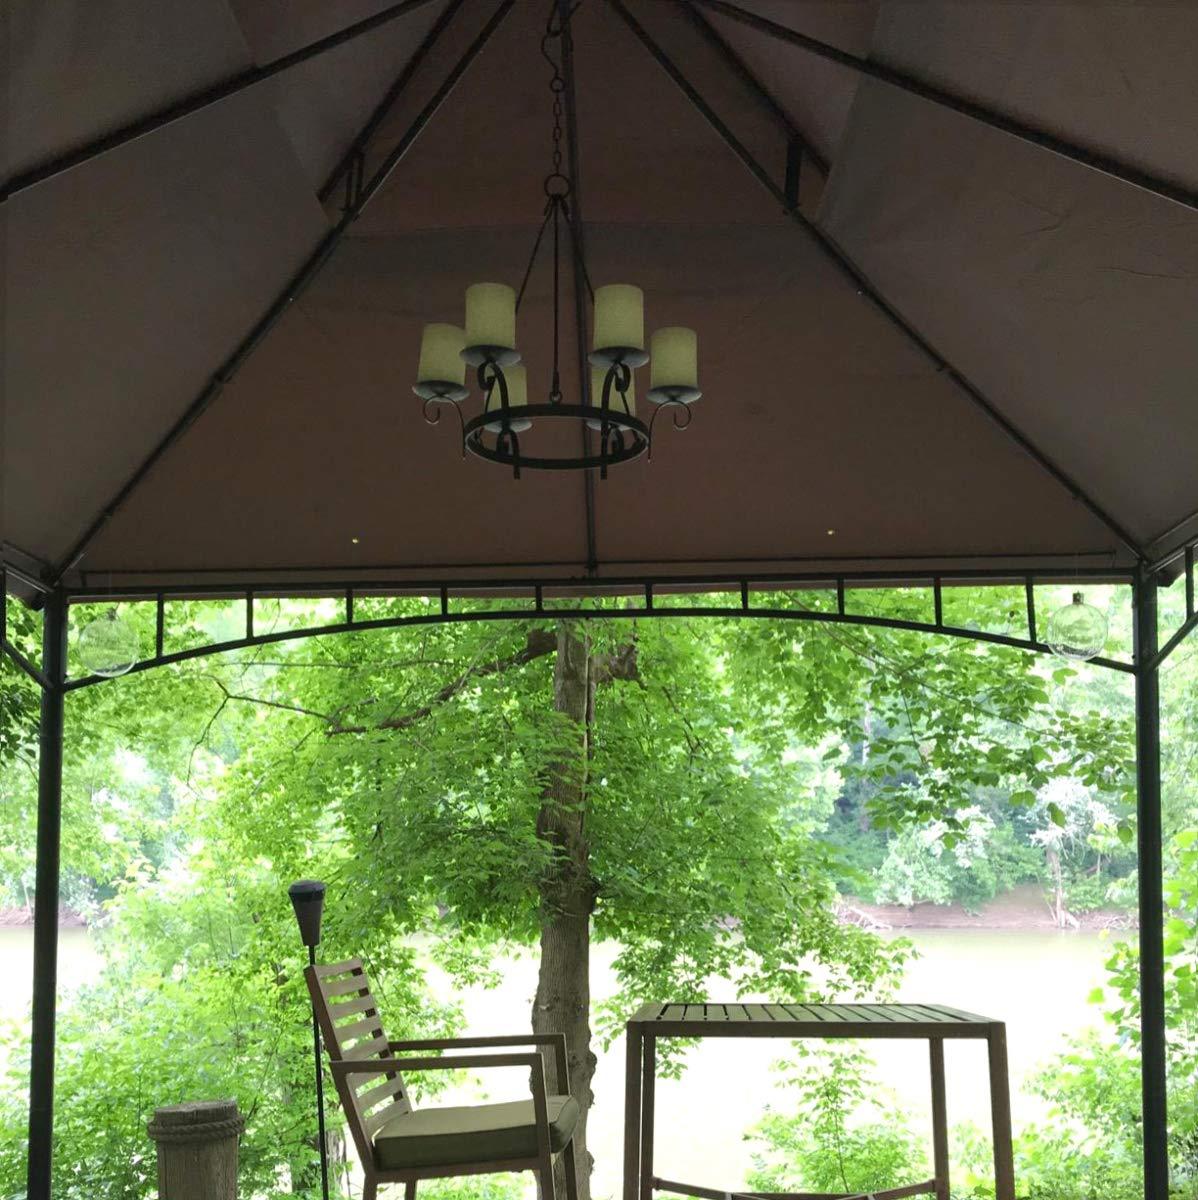 Wrought Iron Hanging Gazebo Candelabra Outdoor Patio Lighting